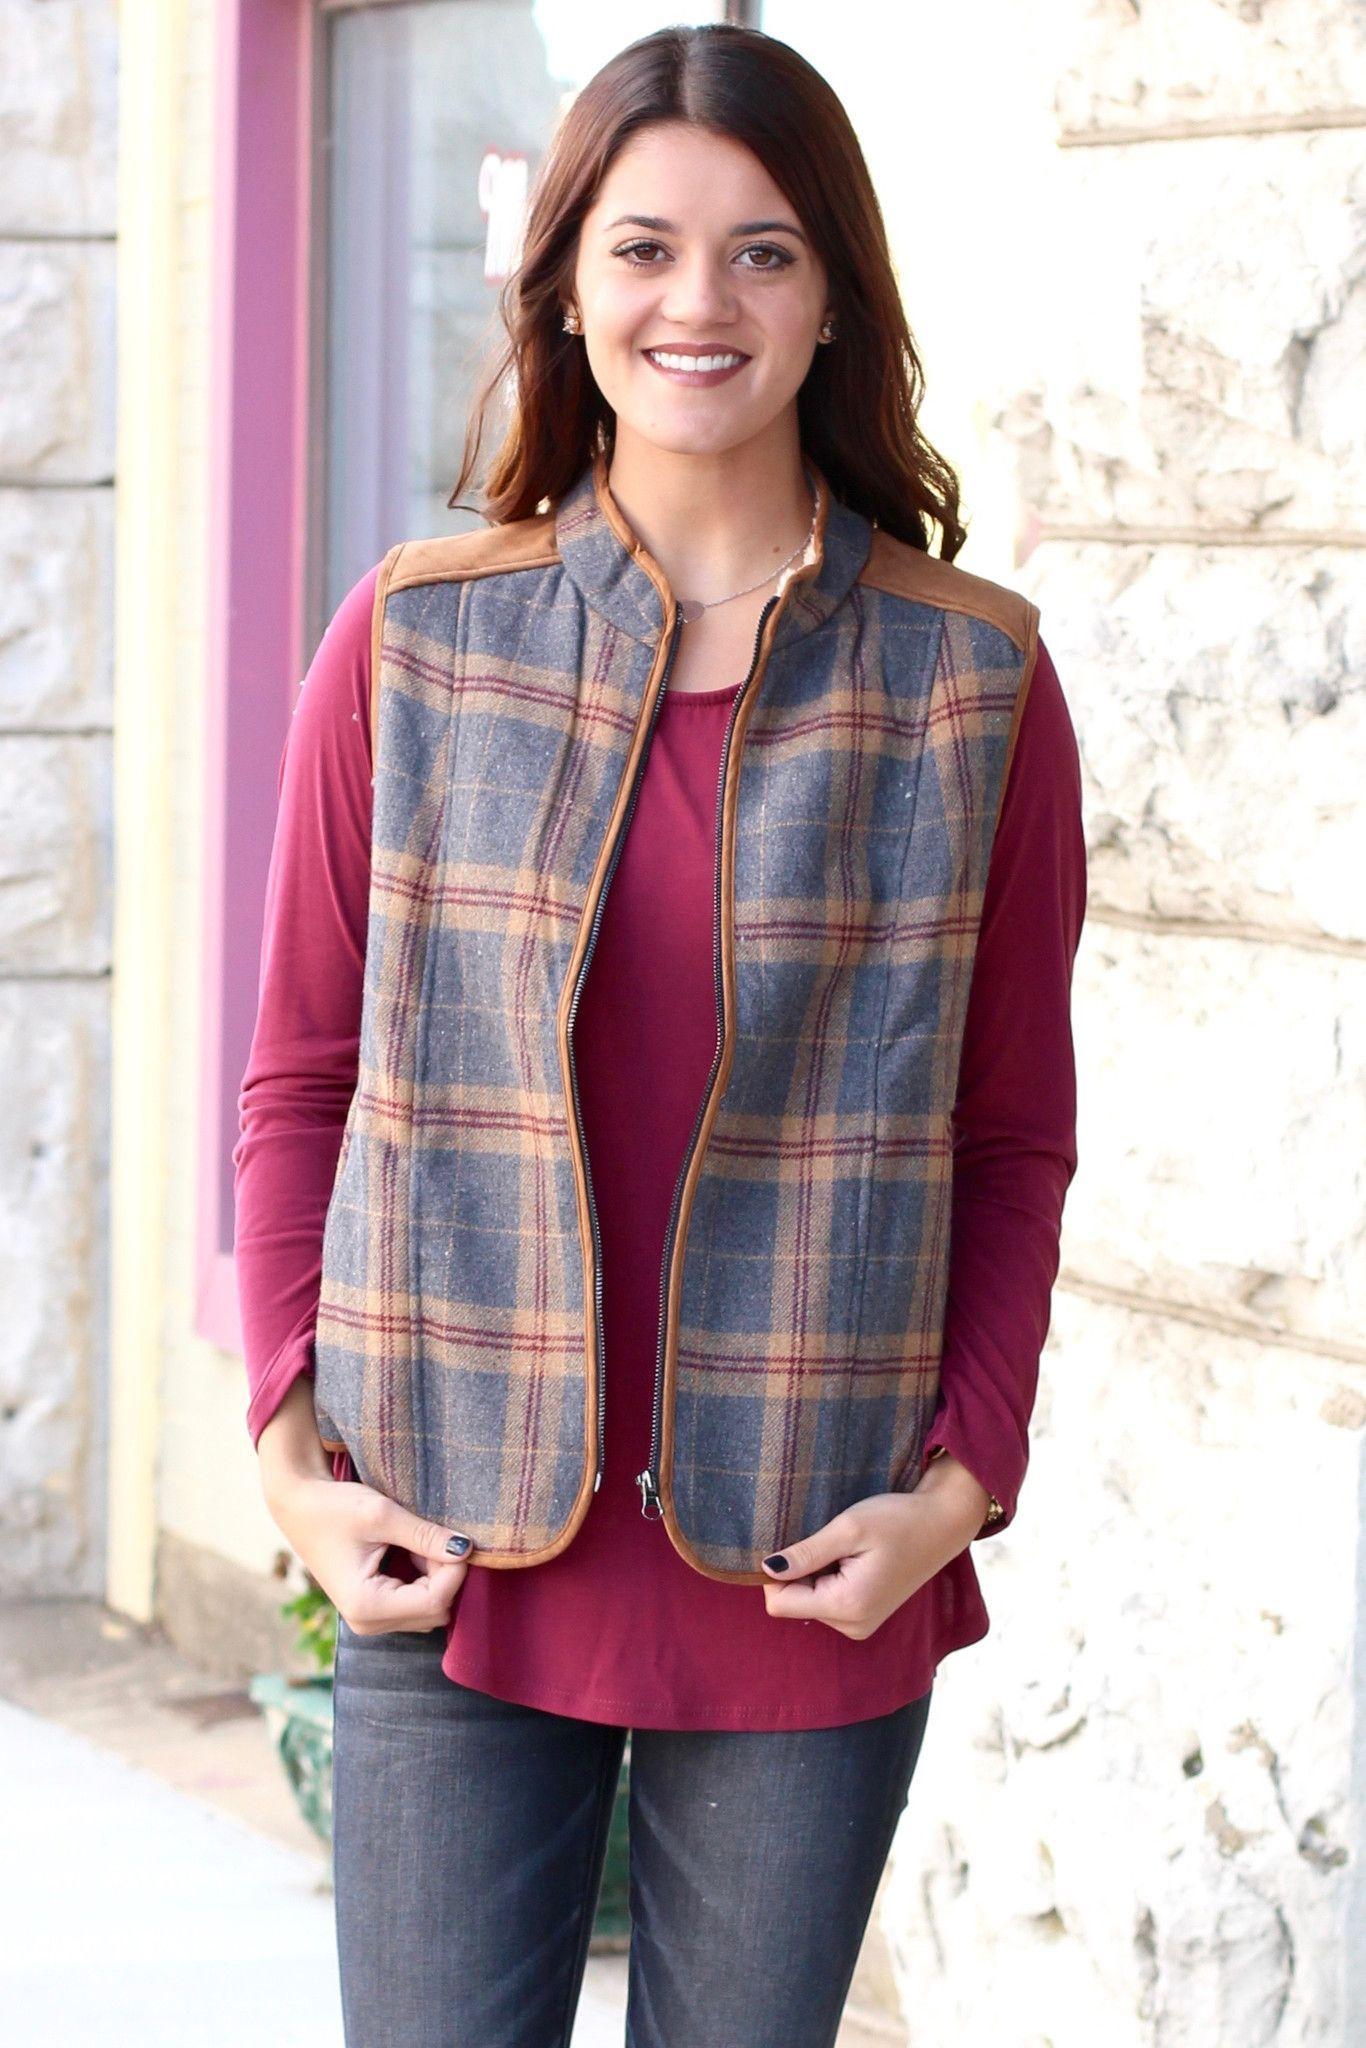 Red flannel vest womens  Fantastic Plaid Flannel  Fur Lined Vest Charcoal  Plaid flannel